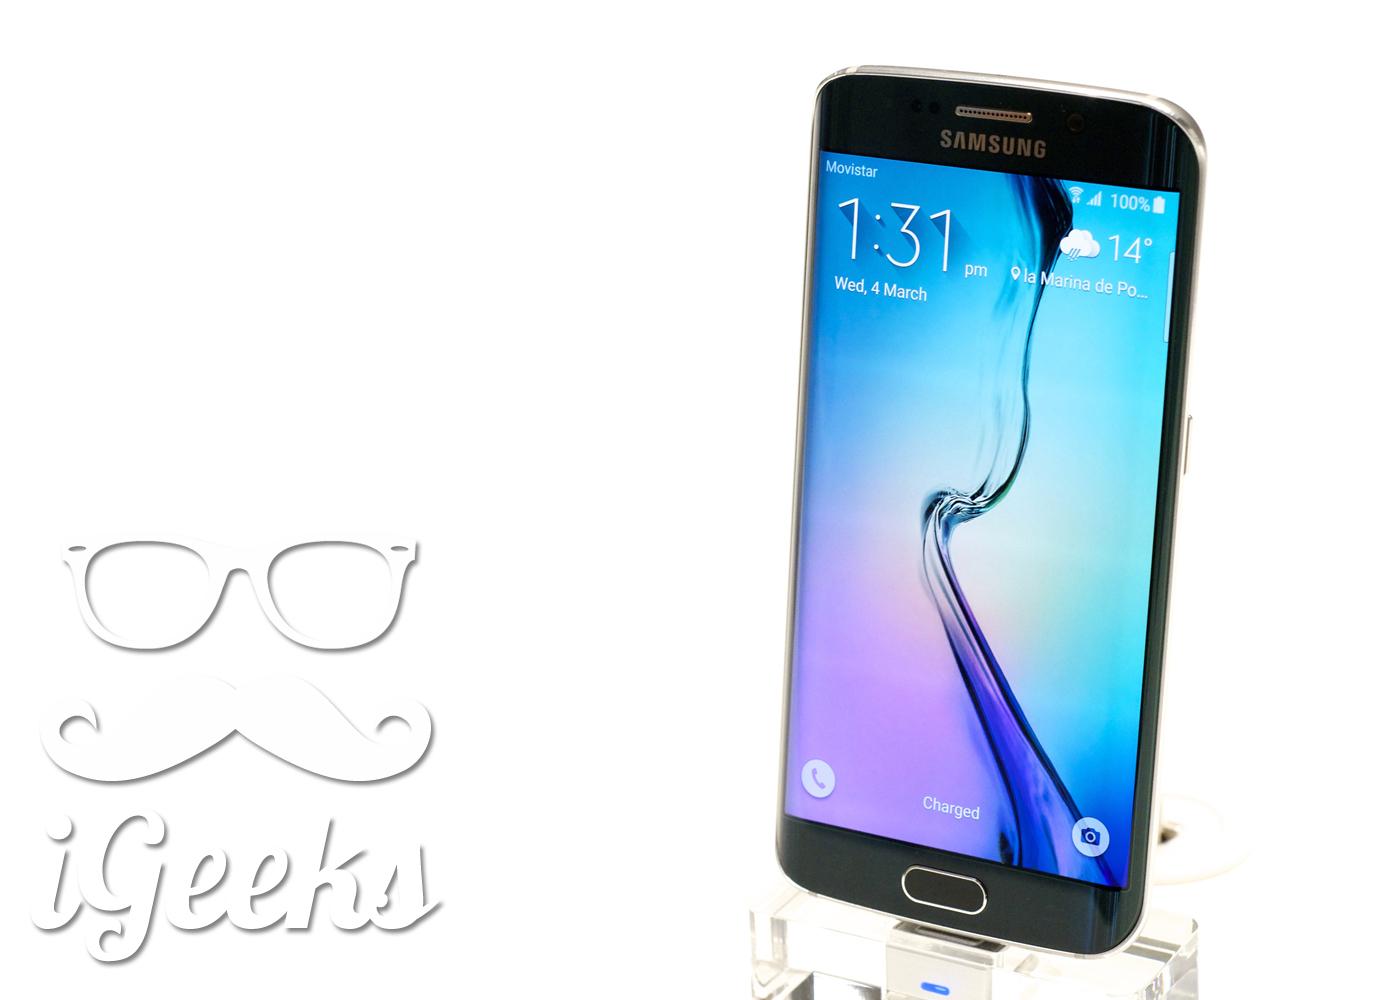 iGeeks-Samsung-S6-MWC2015-32